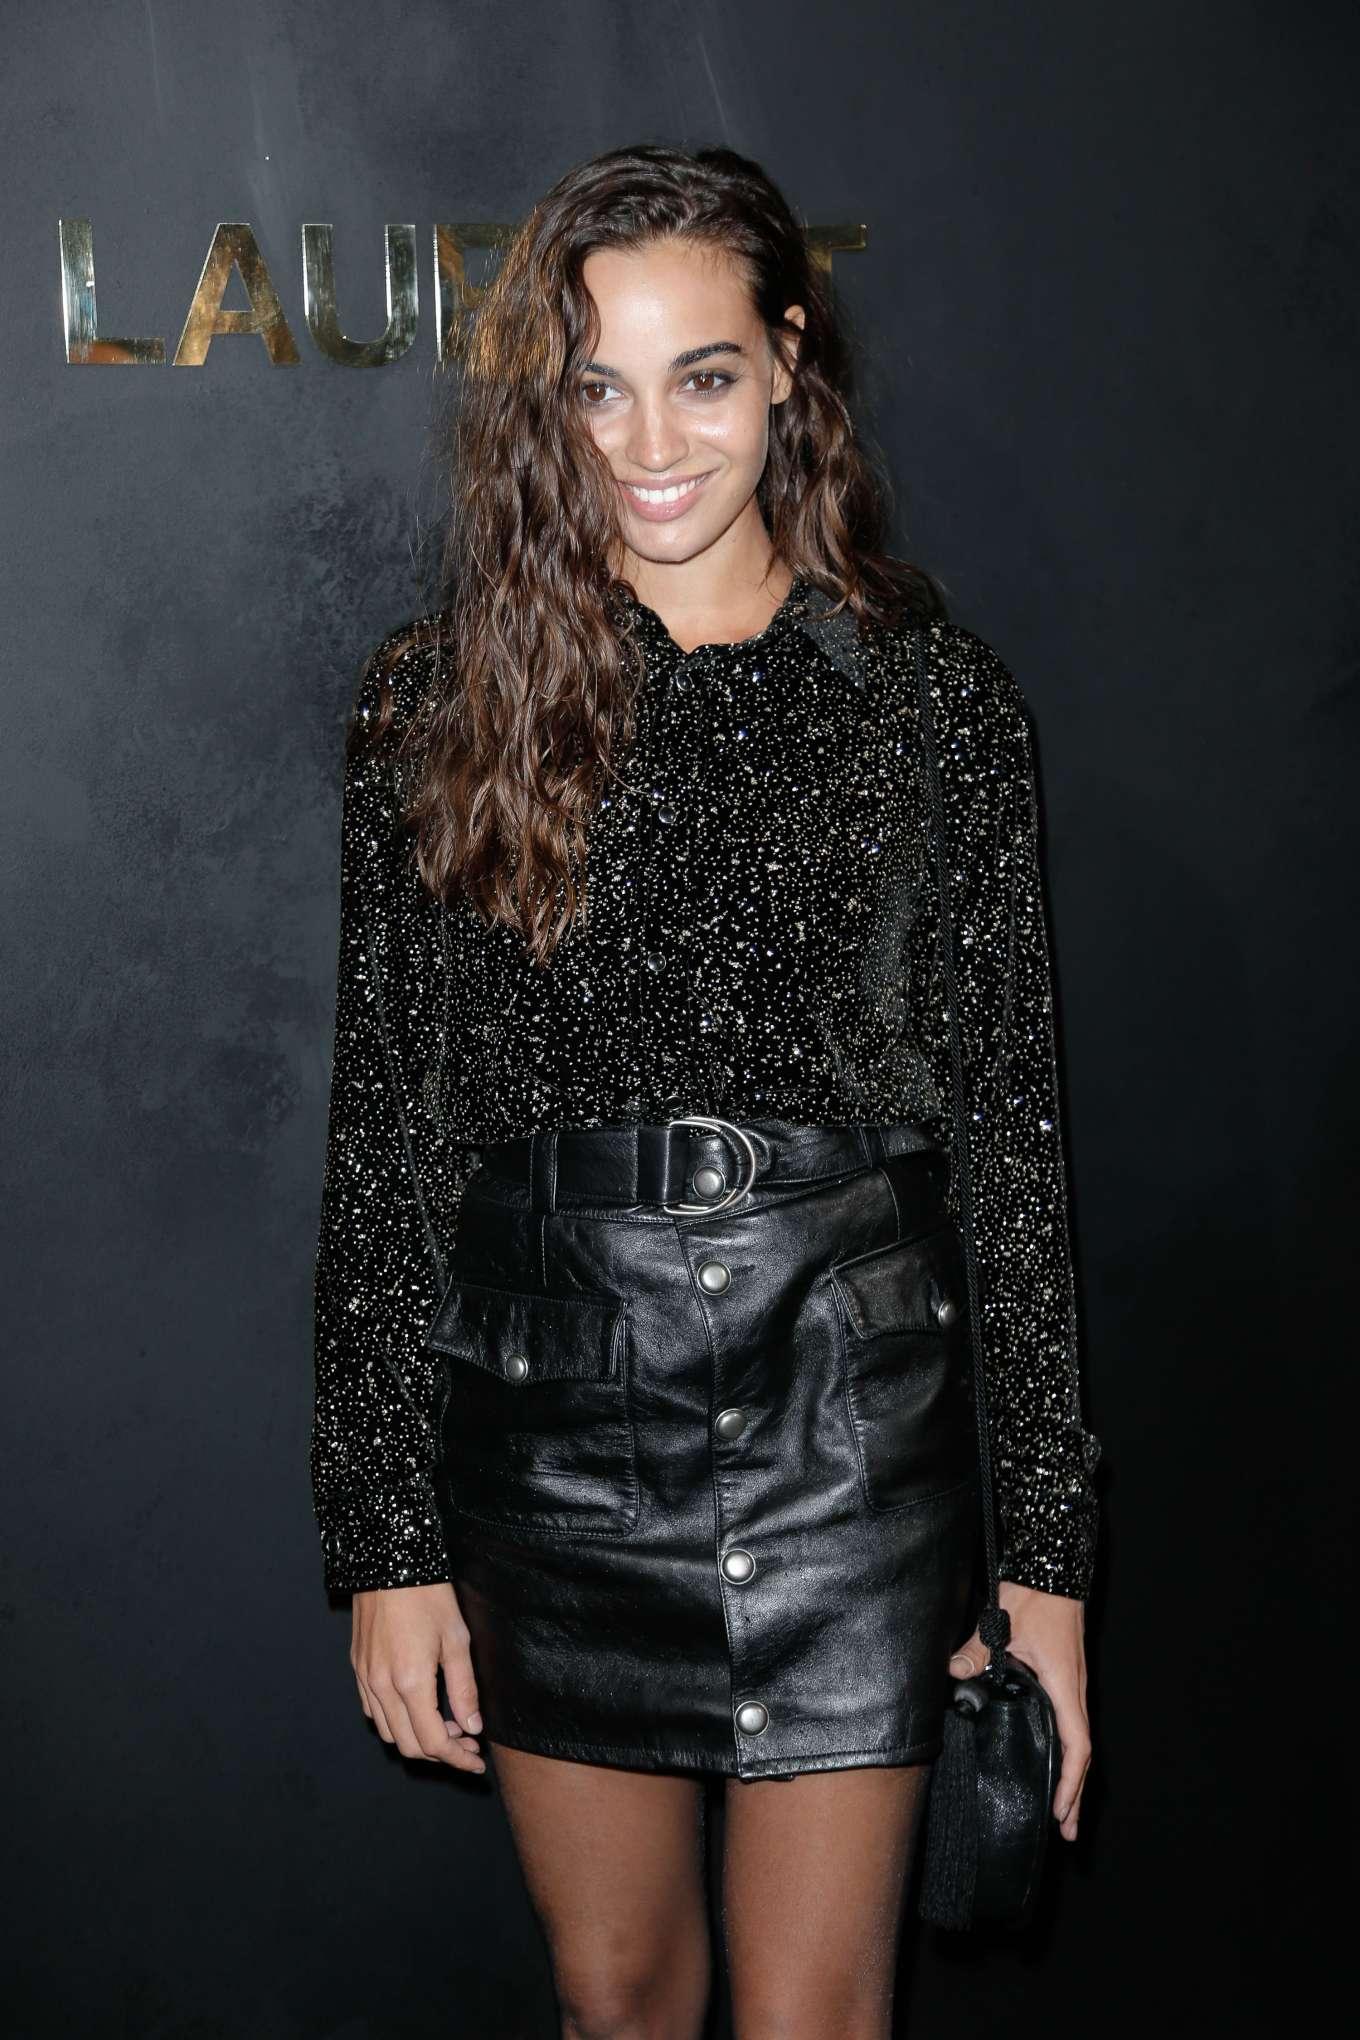 Souheila Yacoub - Saint Laurent Womenswear SS 2020 Show at Paris Fashion Week